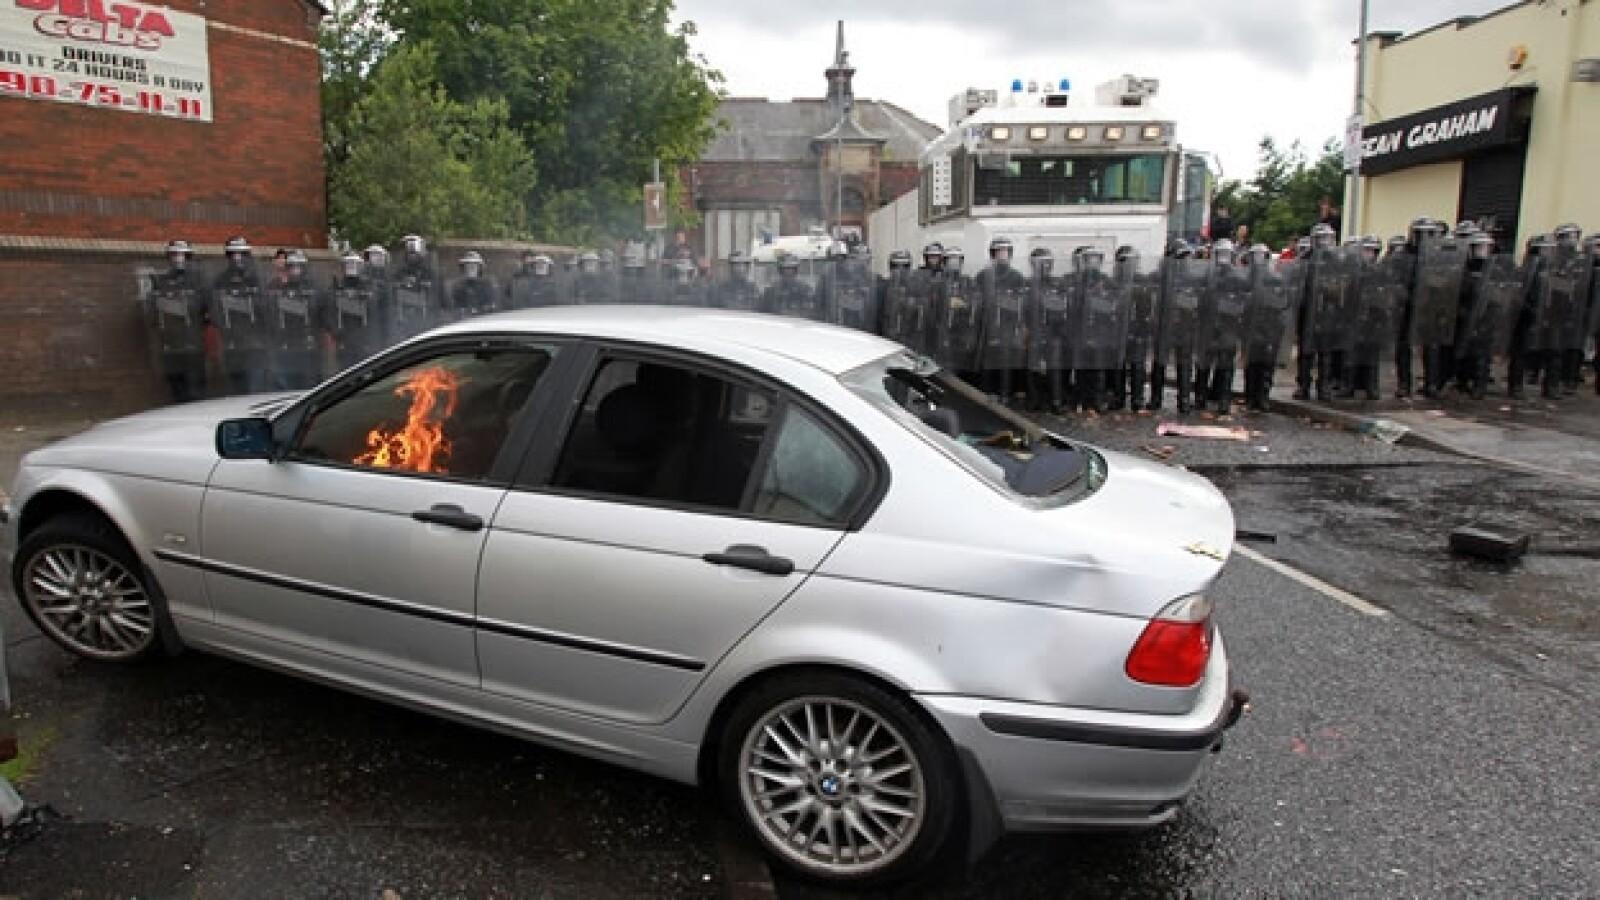 CATOLICOS, PROTESTANTES